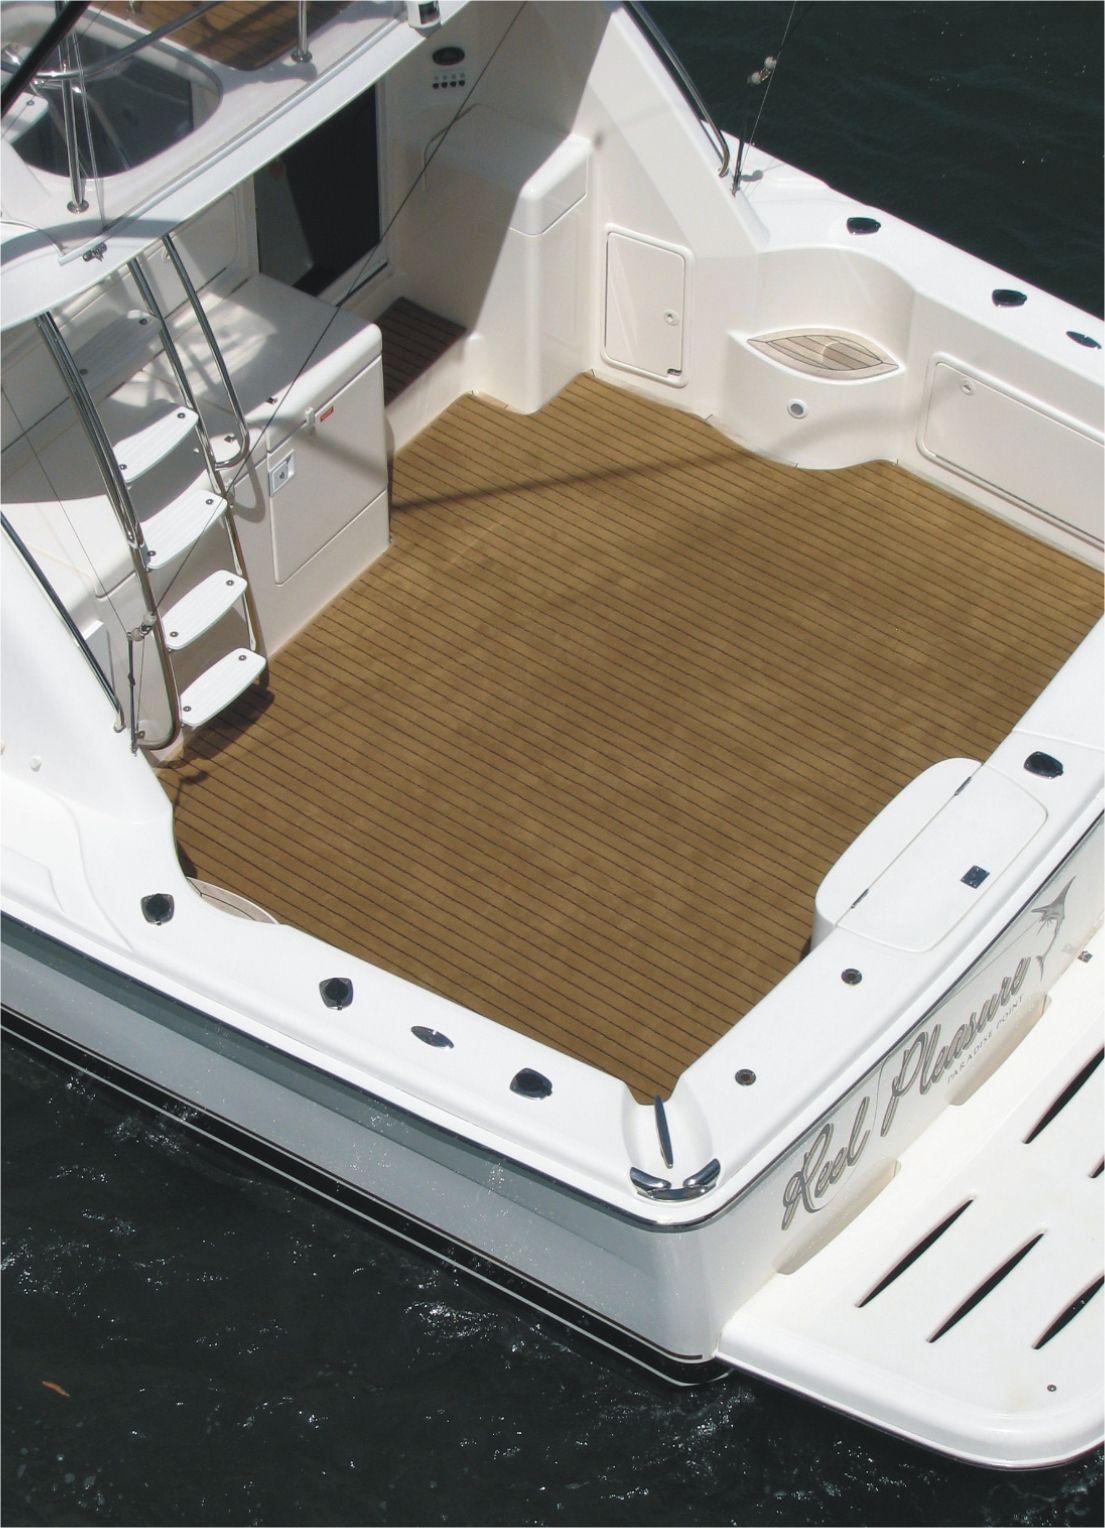 Marine Tuft Carpet Flooring Marine Tuft Carpeting Is The